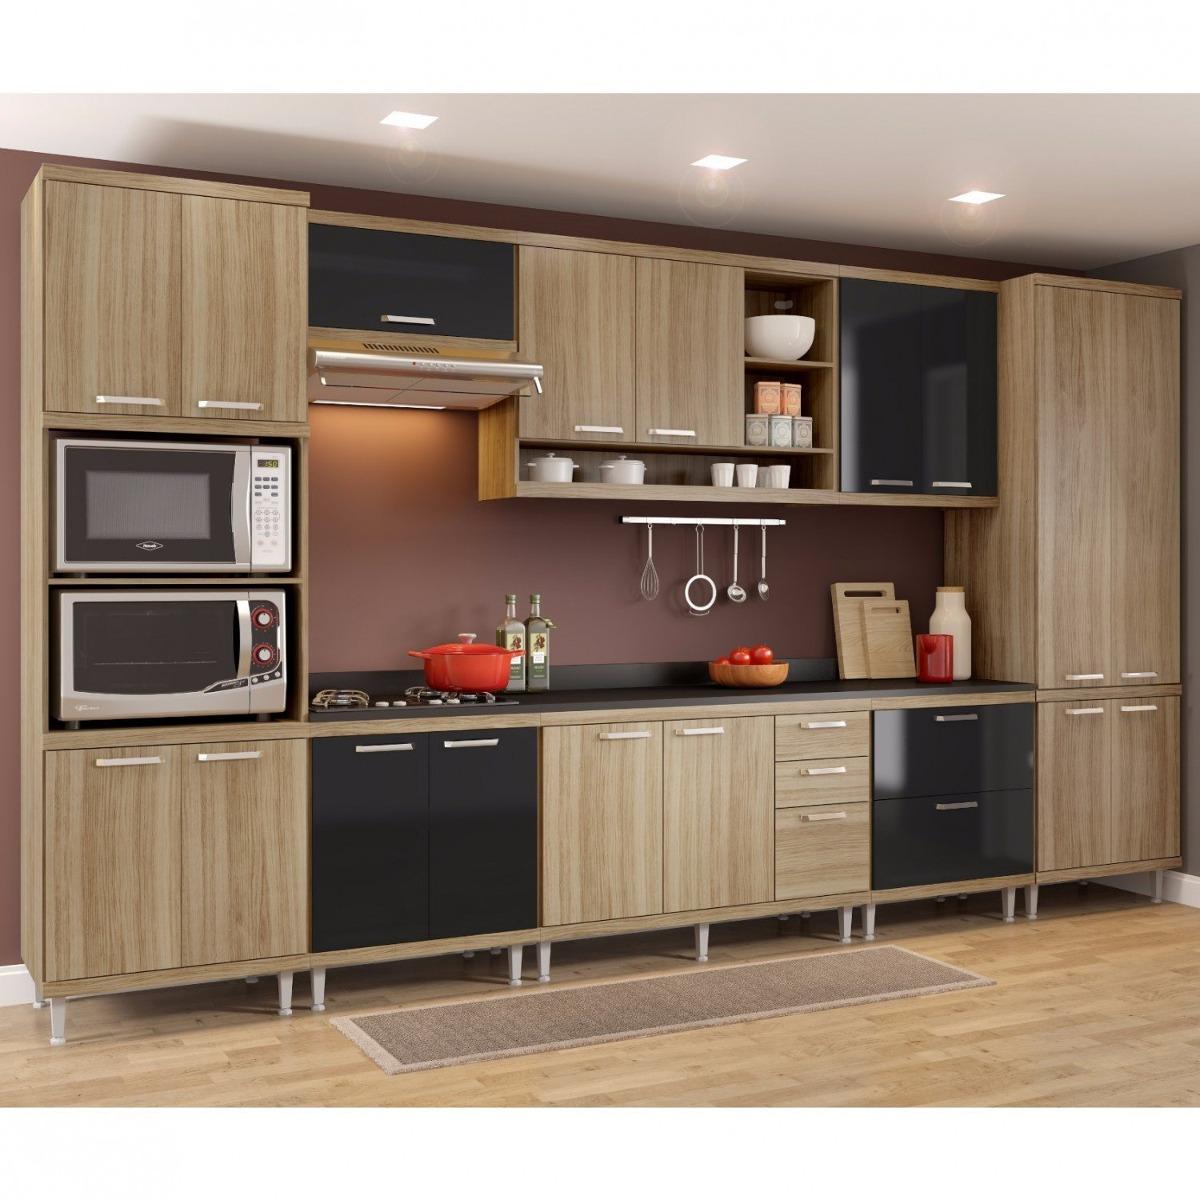 Cozinha Completa 9 Pe As Sic Lia S16t Multim Veis Gd R 3 099 90